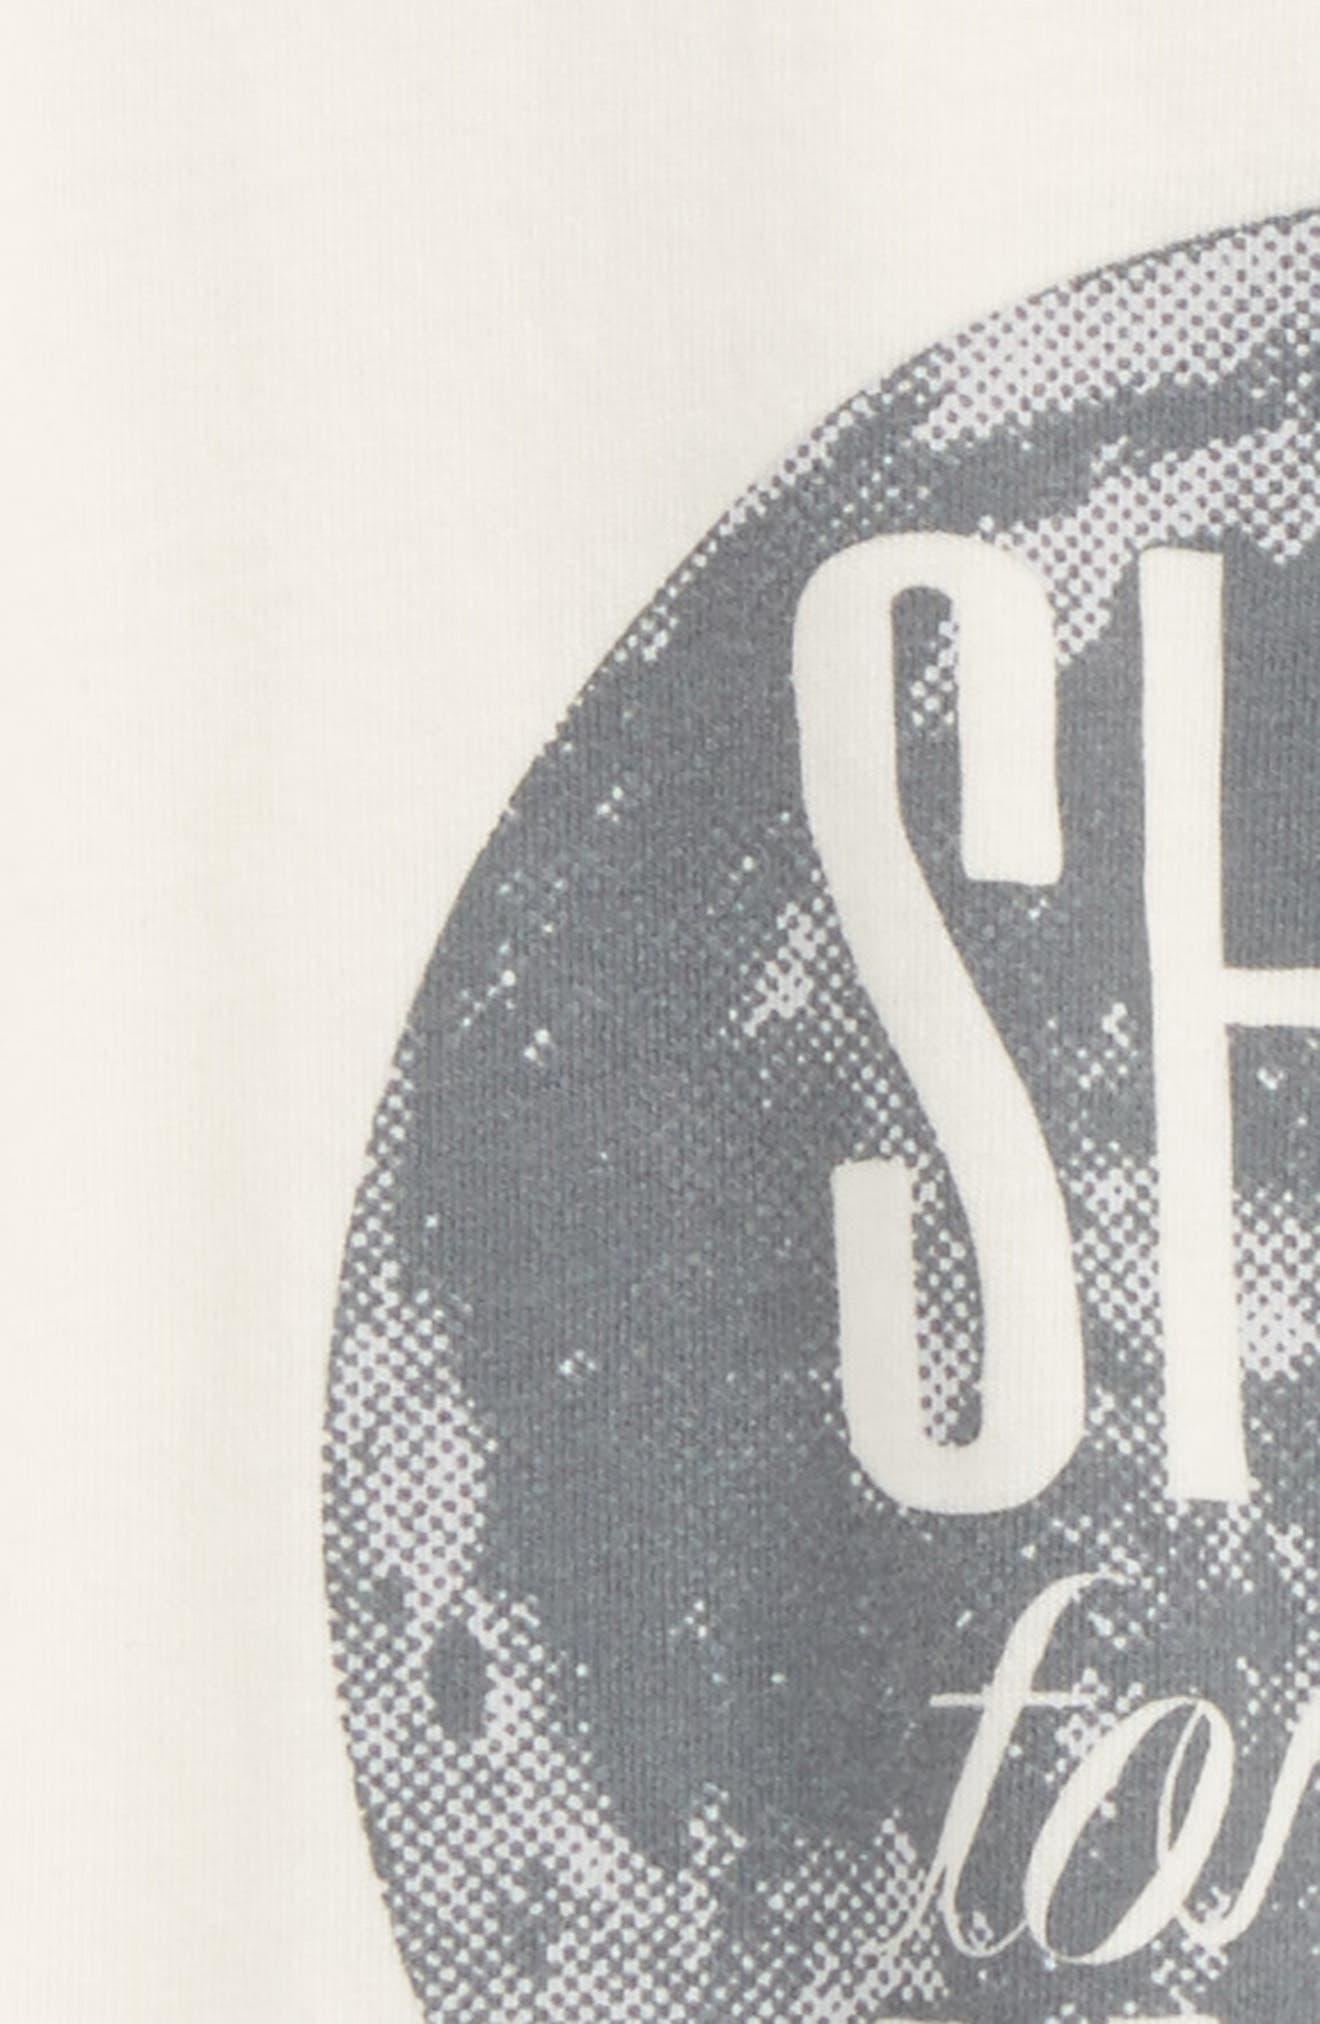 Peek Shoot For The Moon Graphic T-Shirt,                             Alternate thumbnail 2, color,                             255